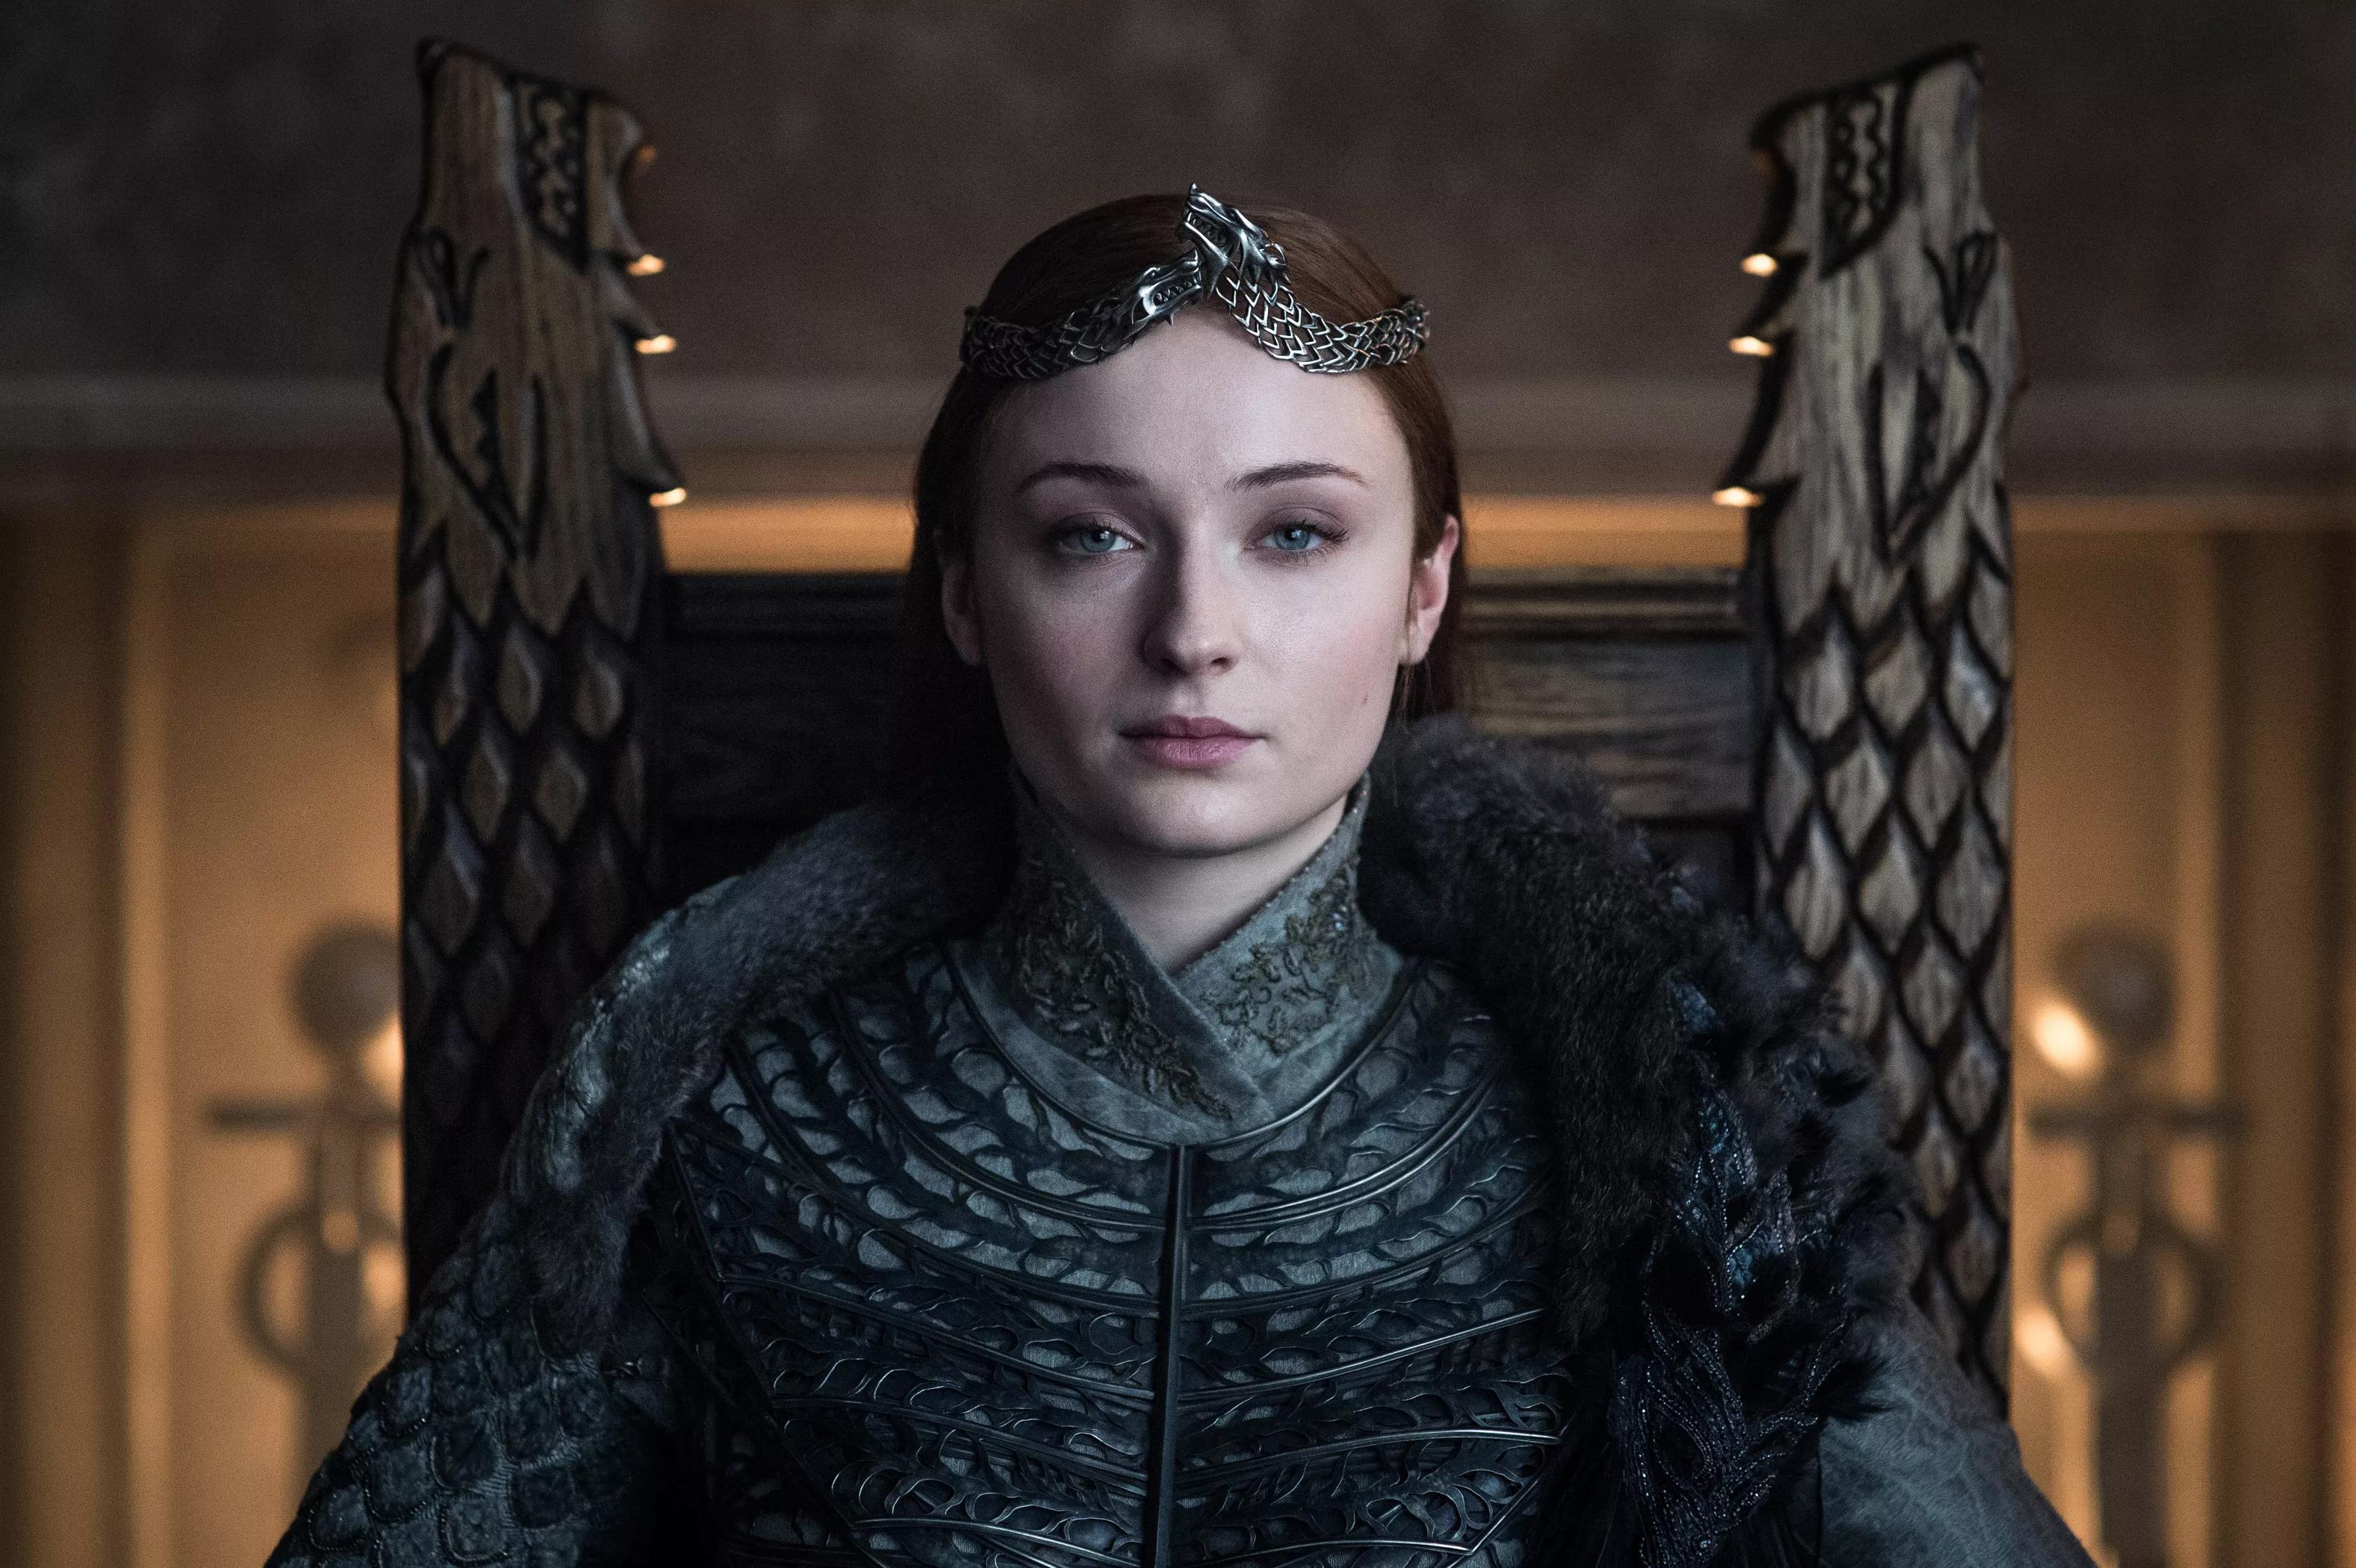 8x06 - The Iron सिंहासन - Sansa